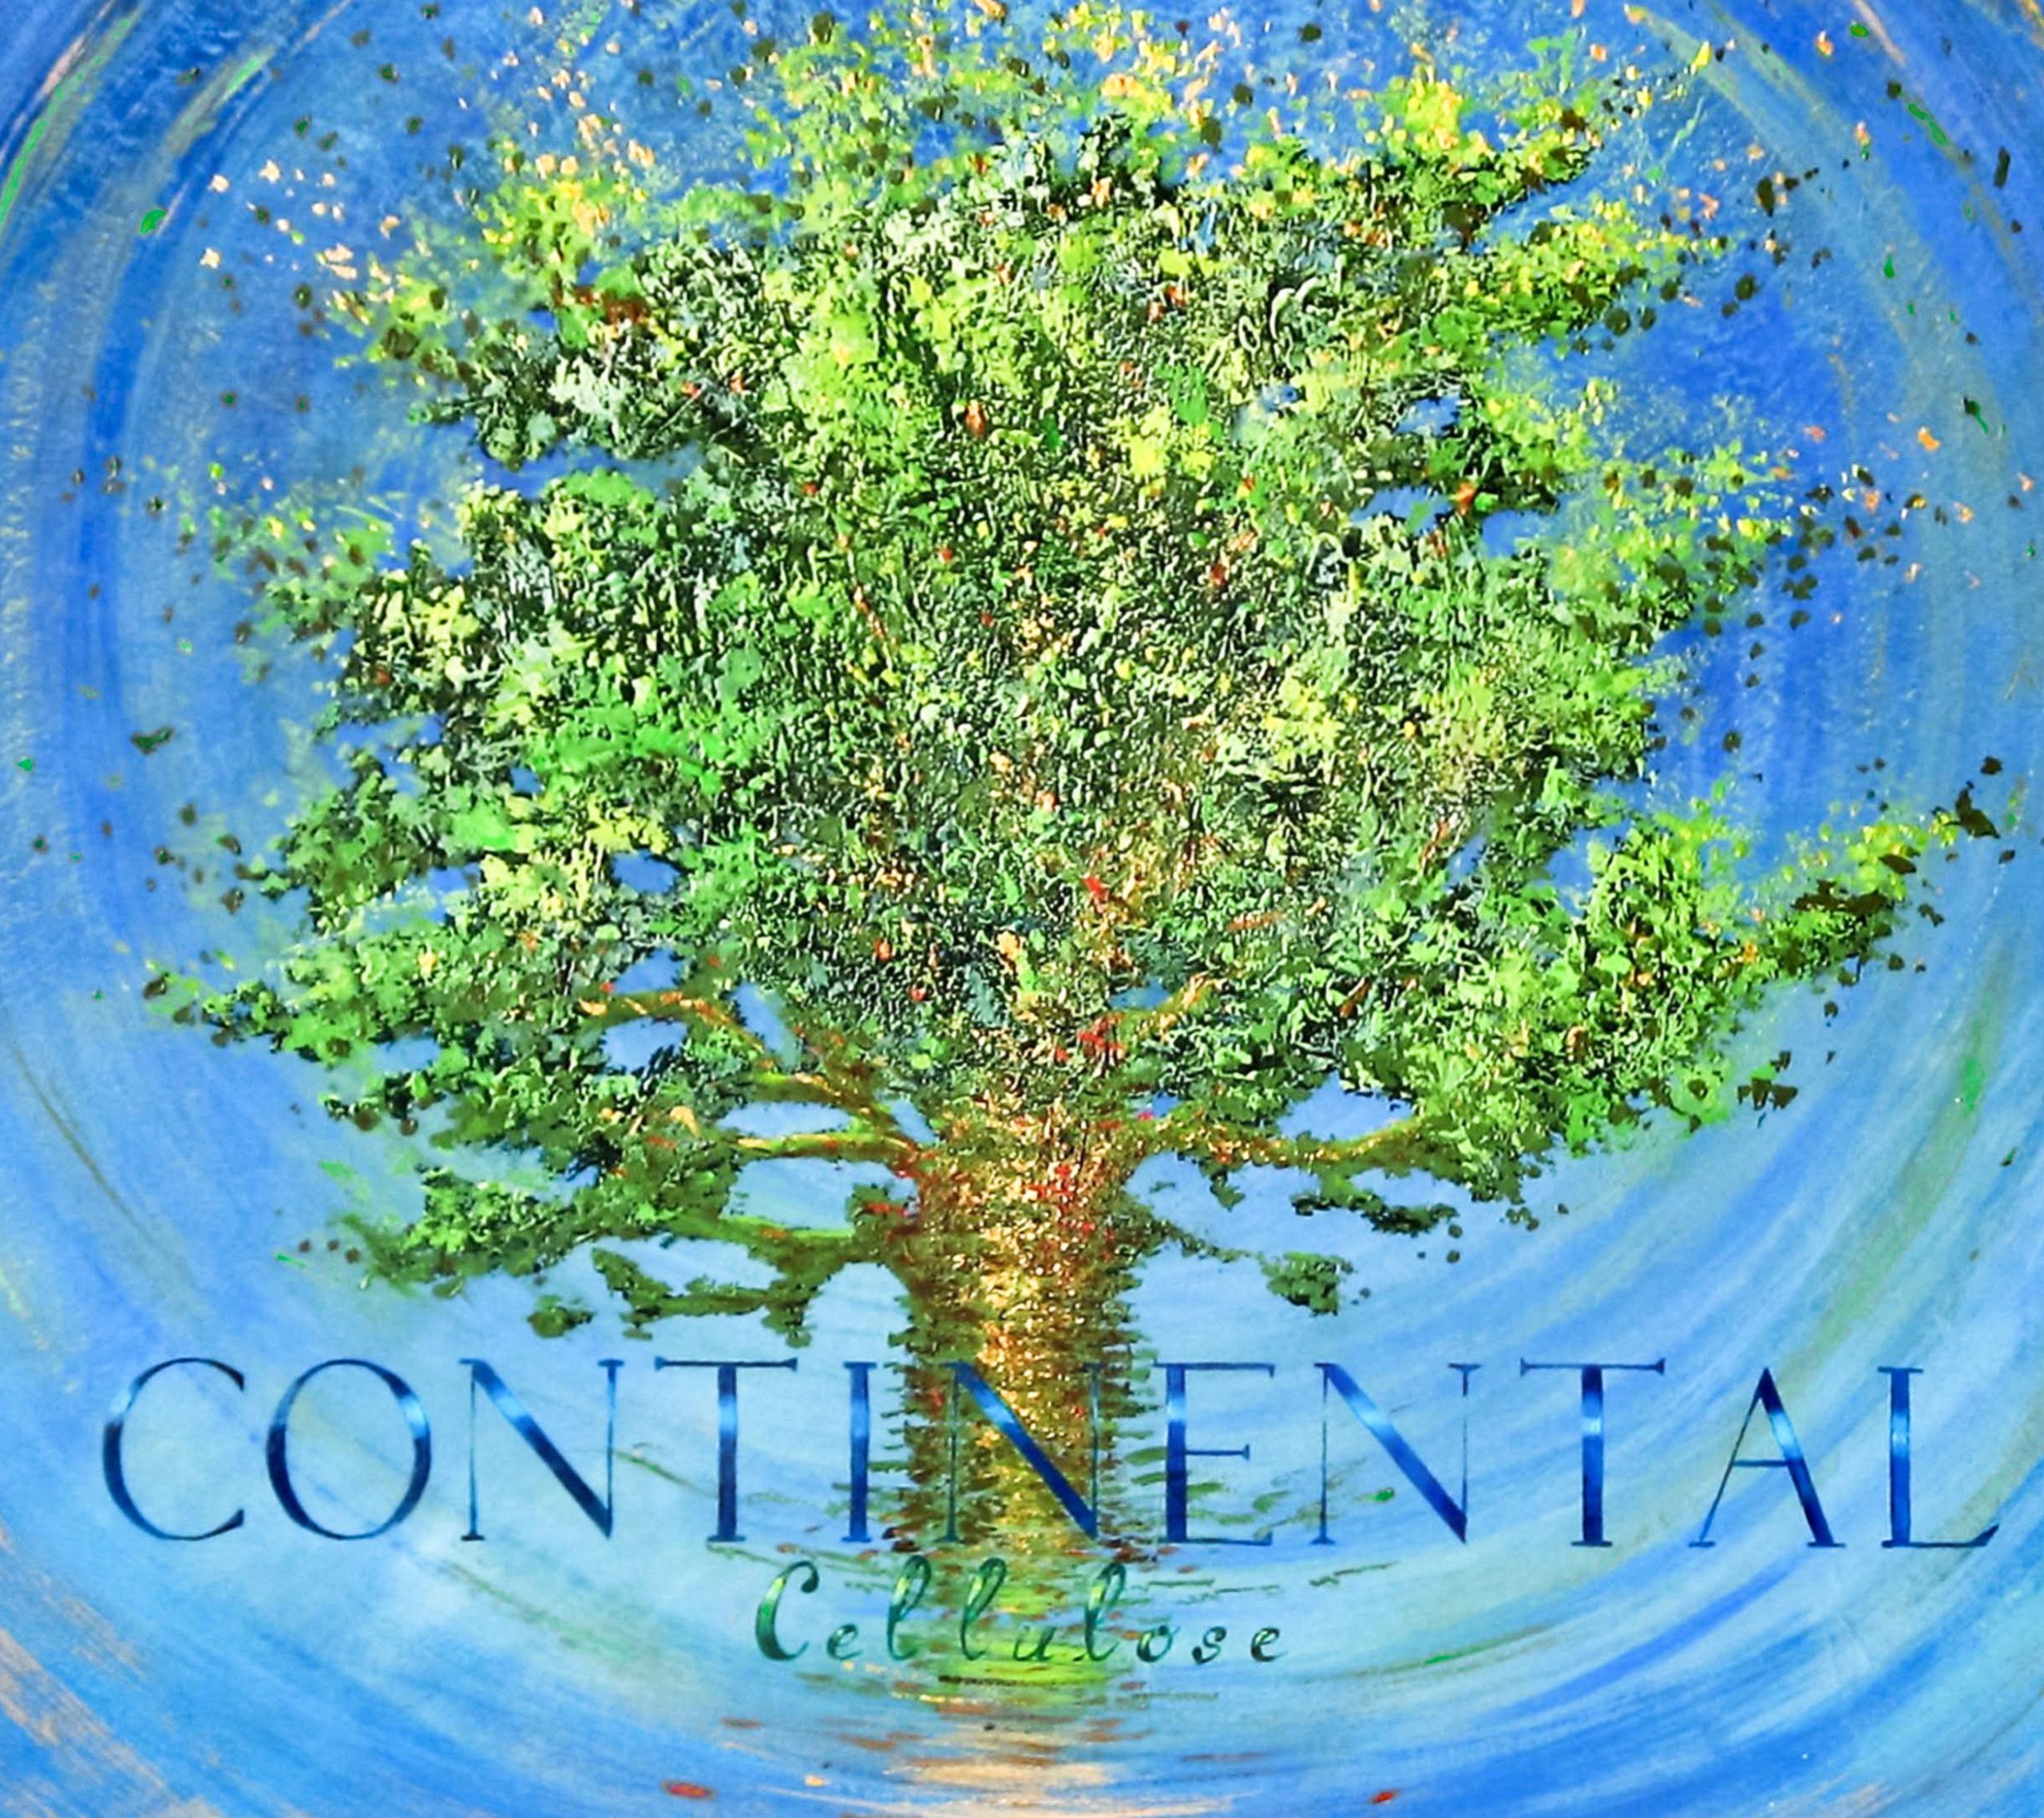 Continental Cellulose